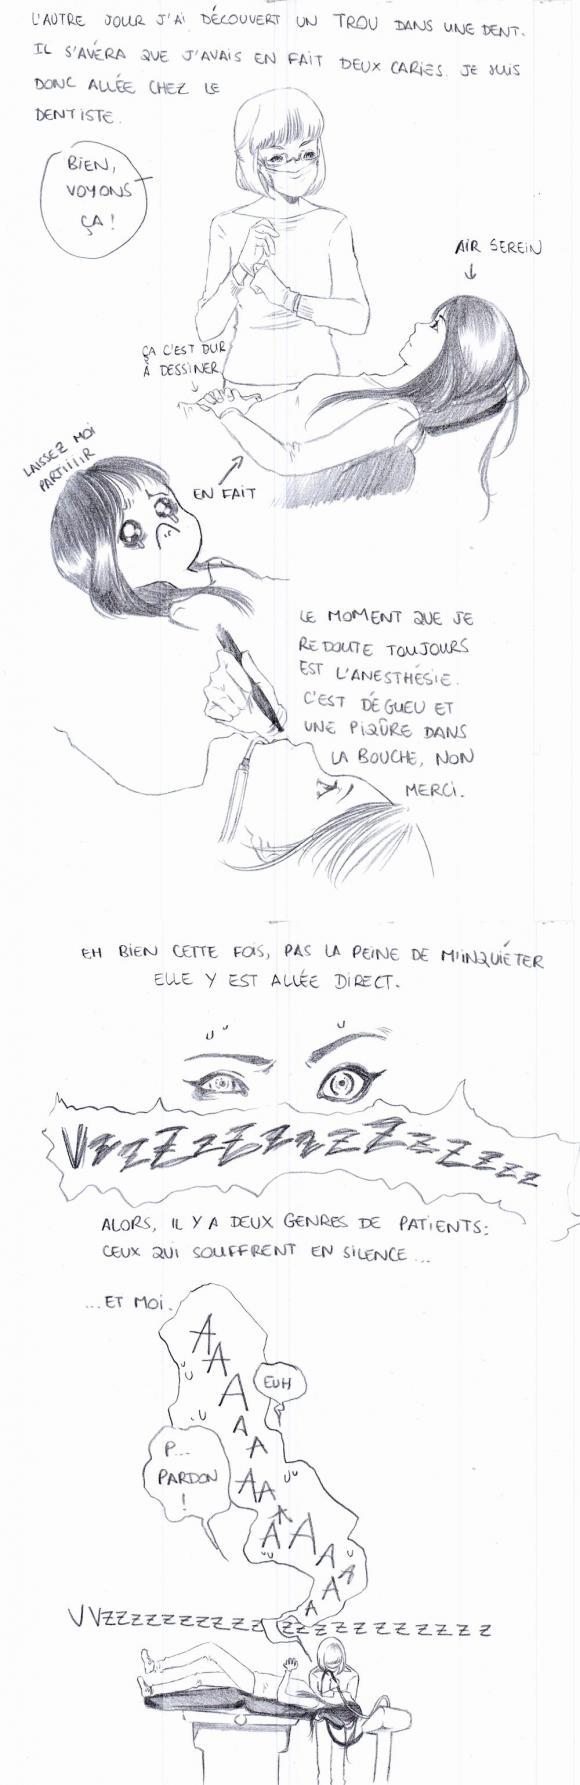 http://laceliah.cowblog.fr/images/Striplife/dentiste.jpg